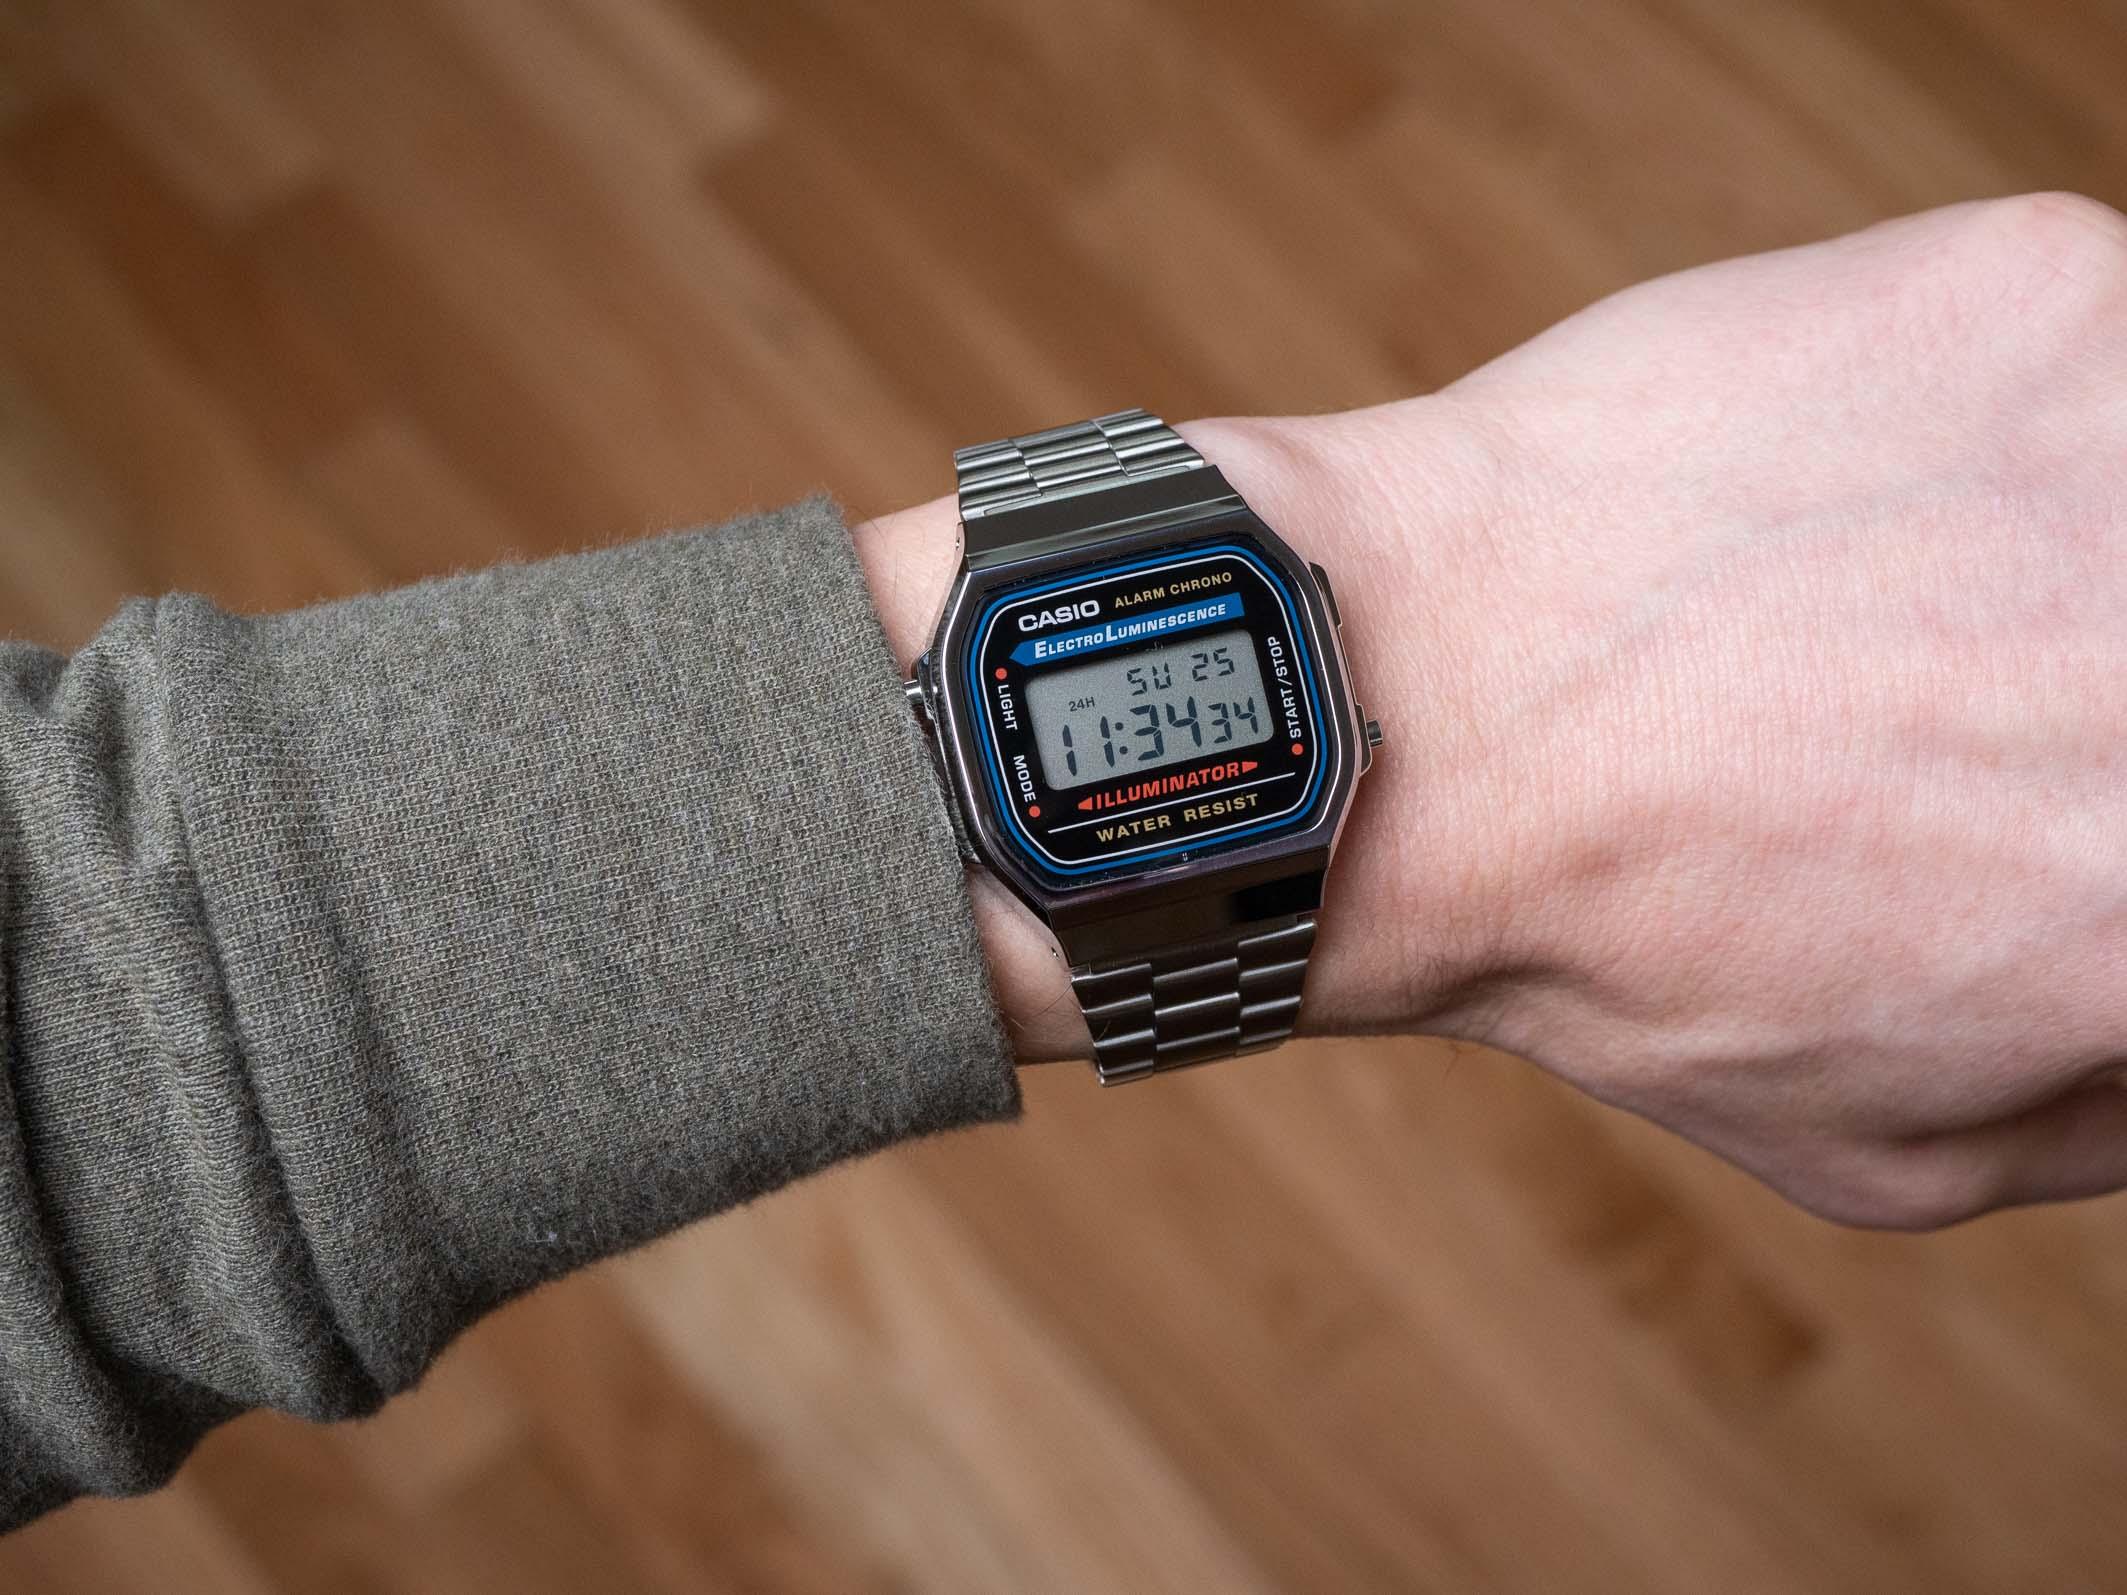 Casio A168 on wrist 2